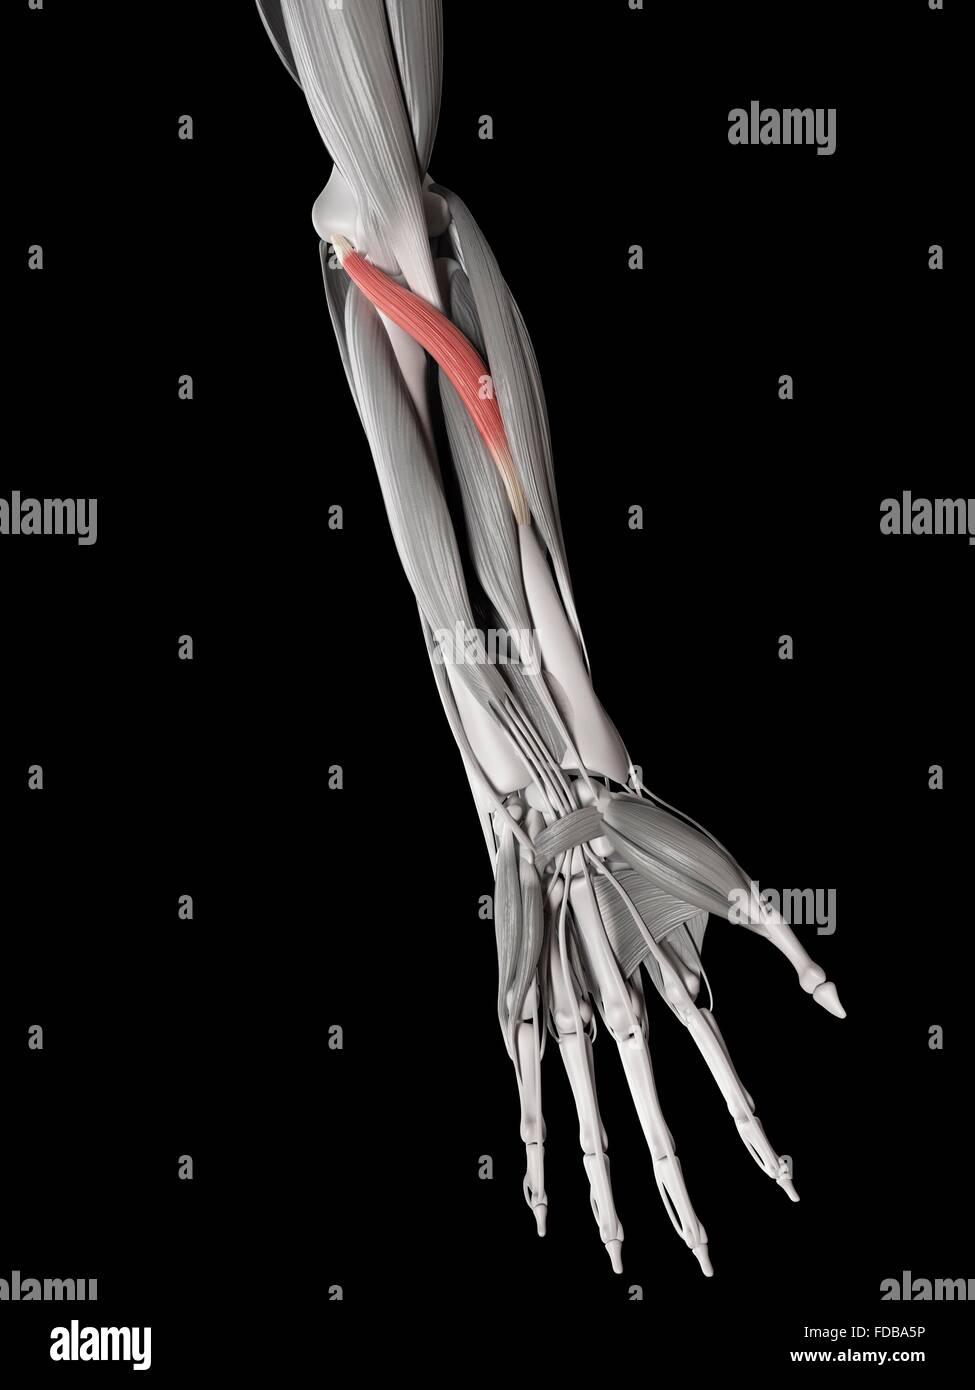 Menschlicher Arm Muskel (Pronator Teres), Illustration Stockfoto ...